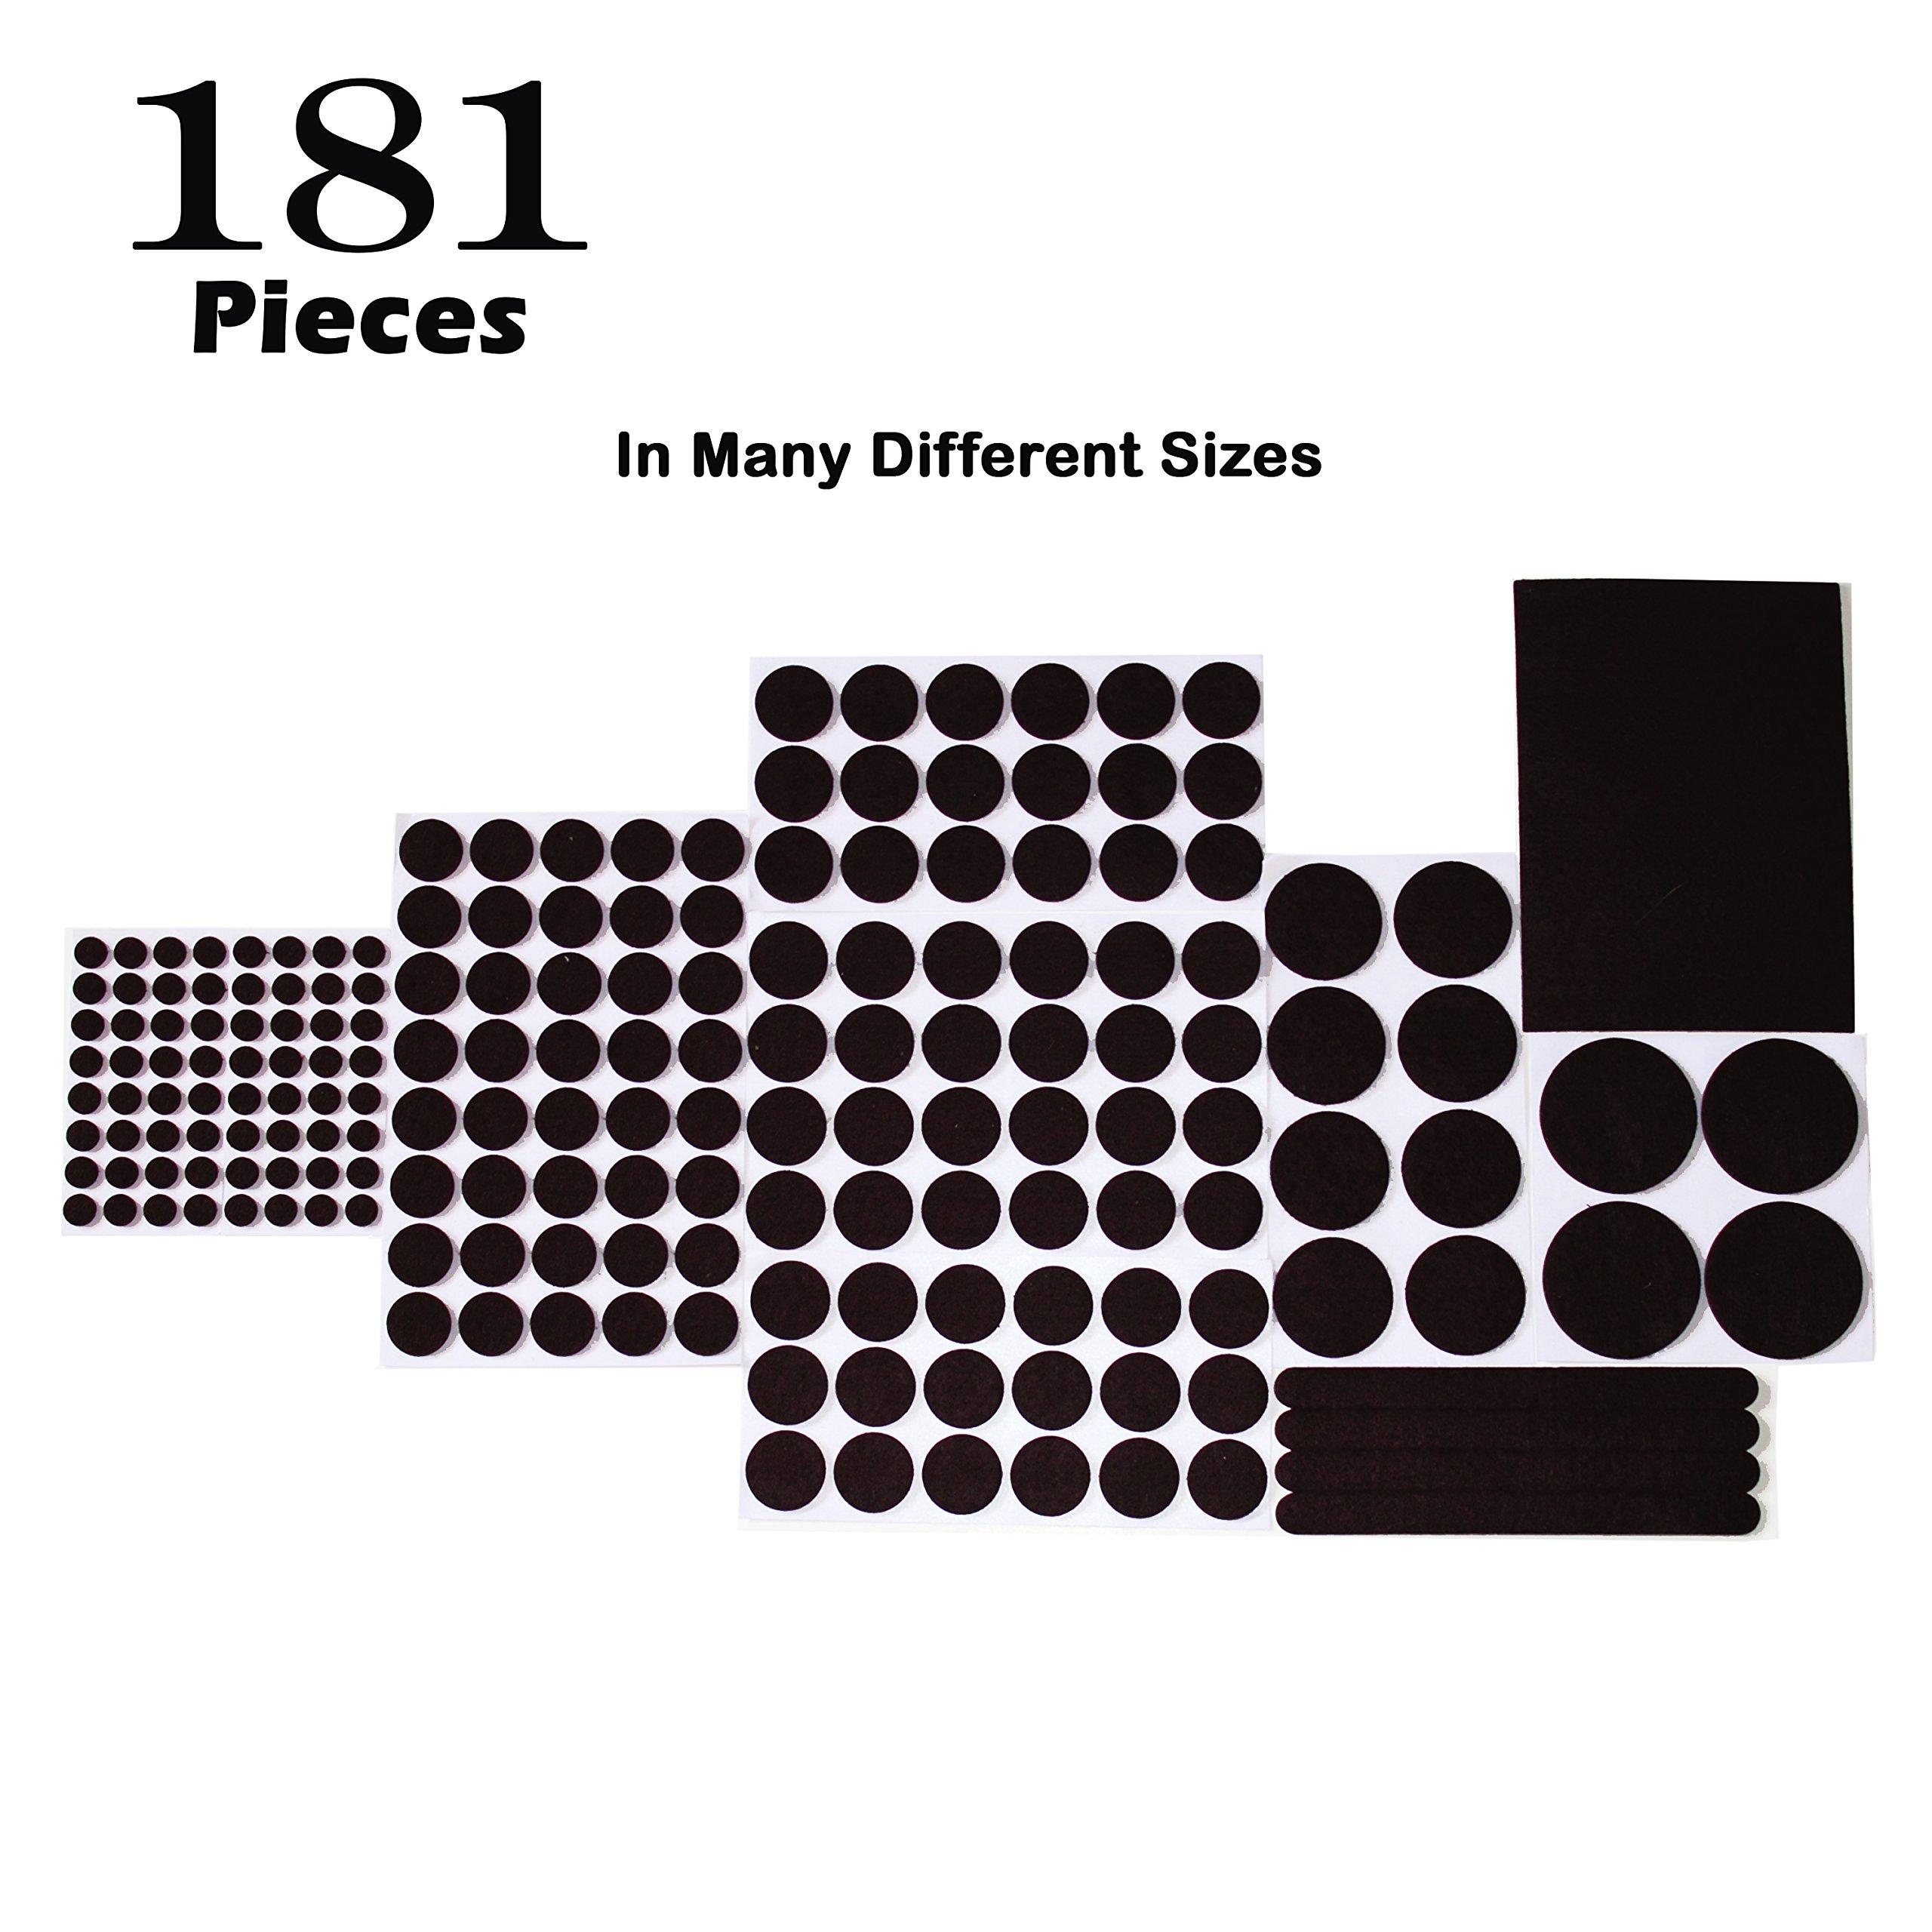 Felt Pads Furniture Feet, K-Guard furniture pads 181 pieces Floor Protector